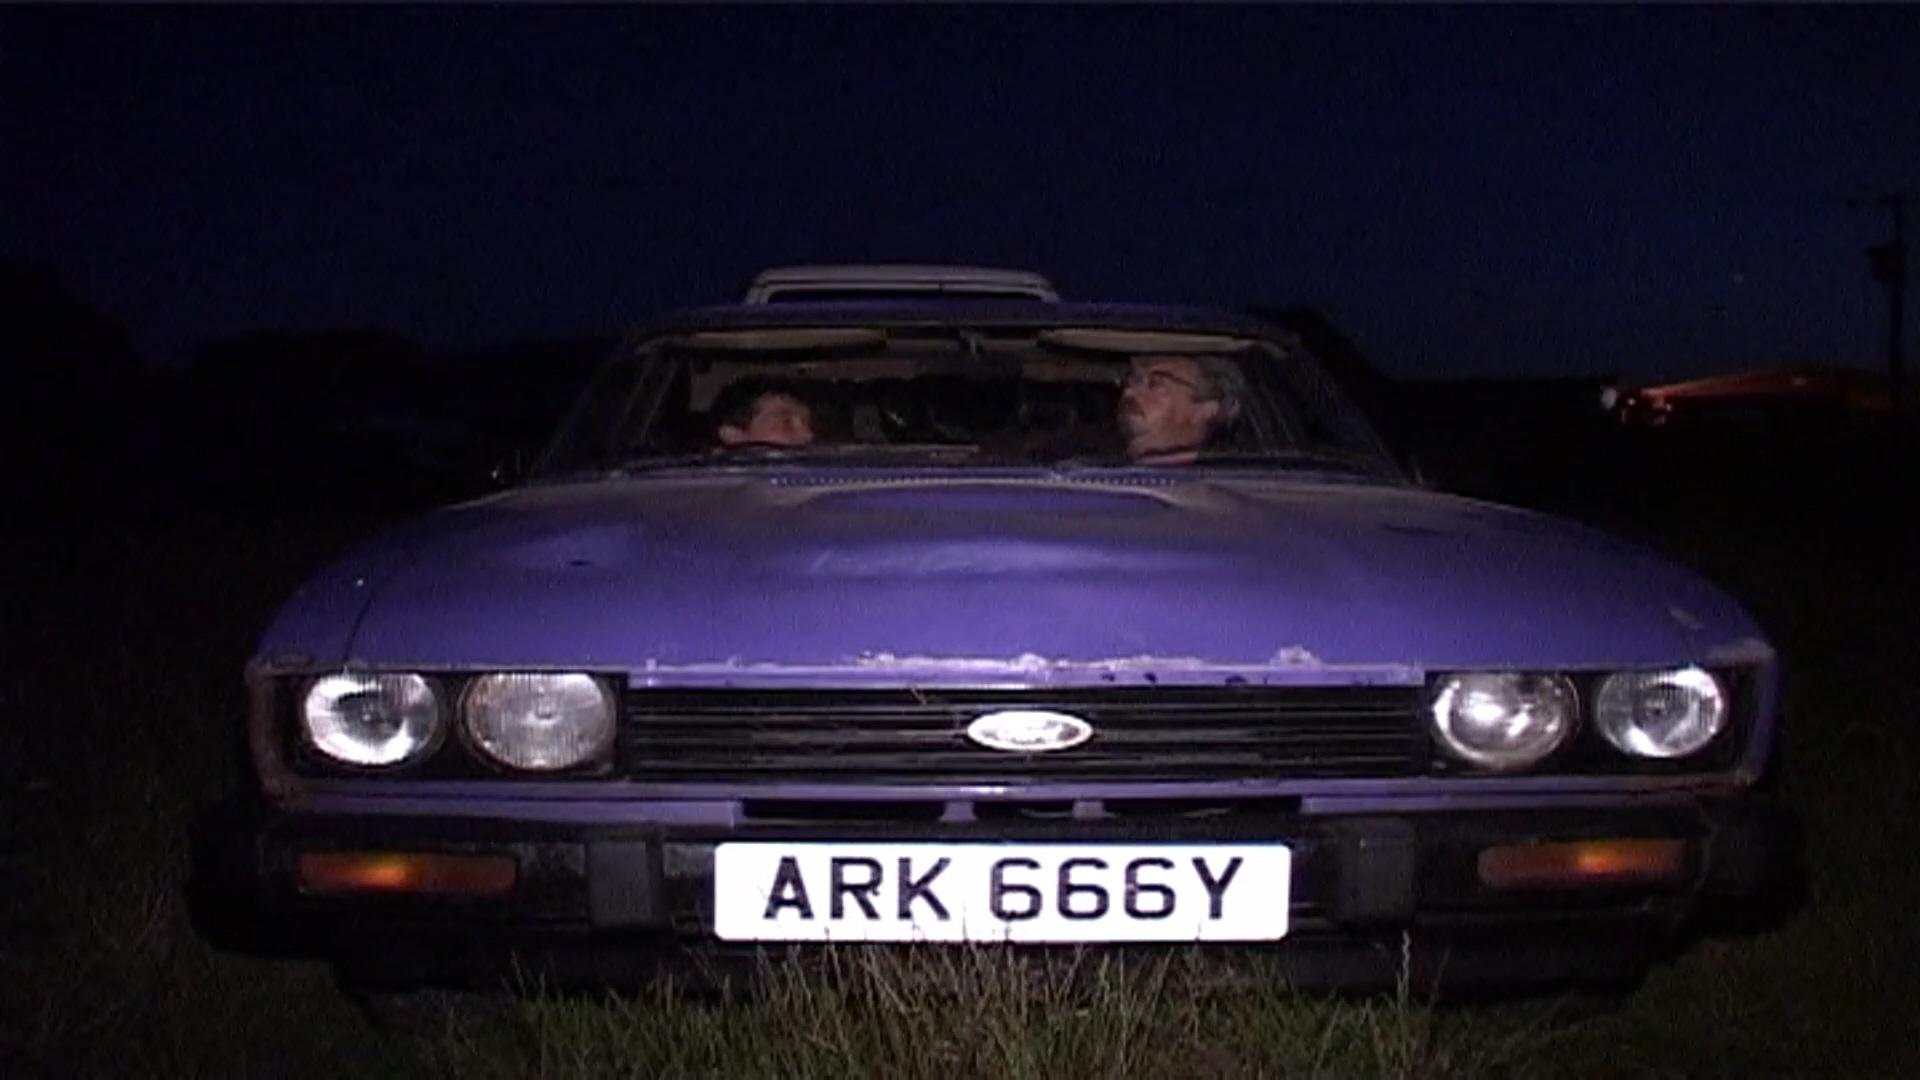 Ghost Cars ARK 666